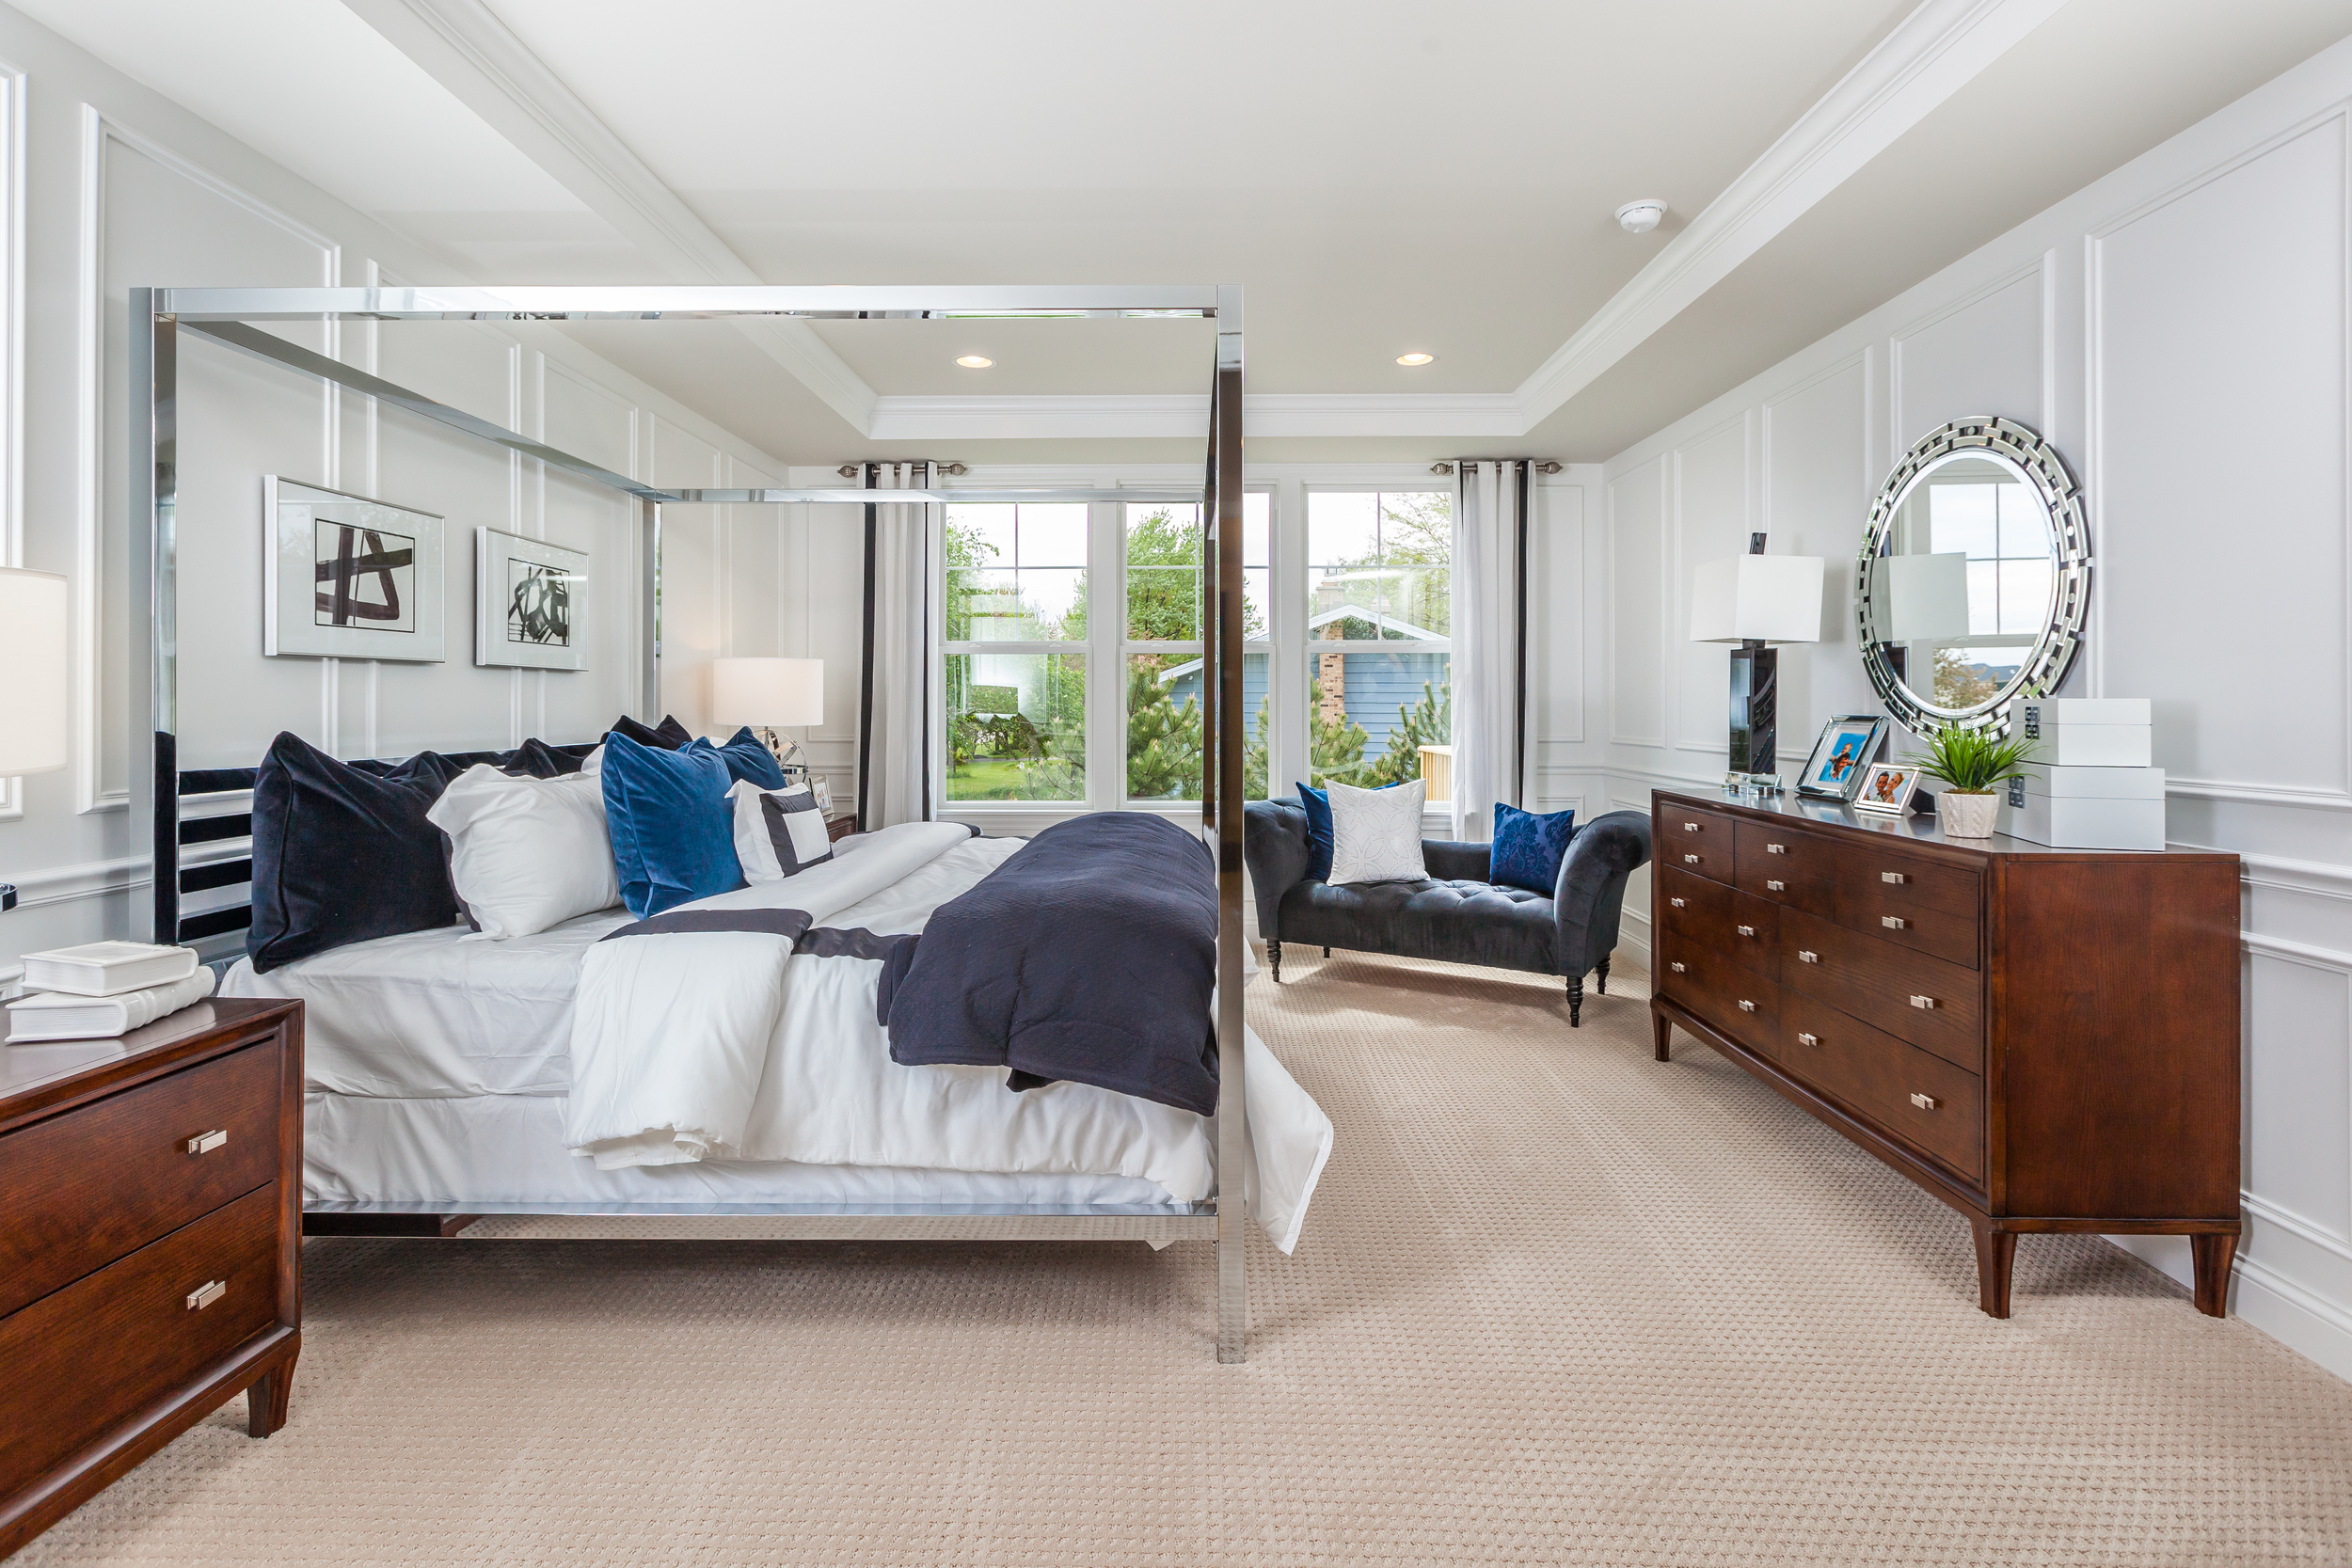 Pulte Master bedroom.jpg